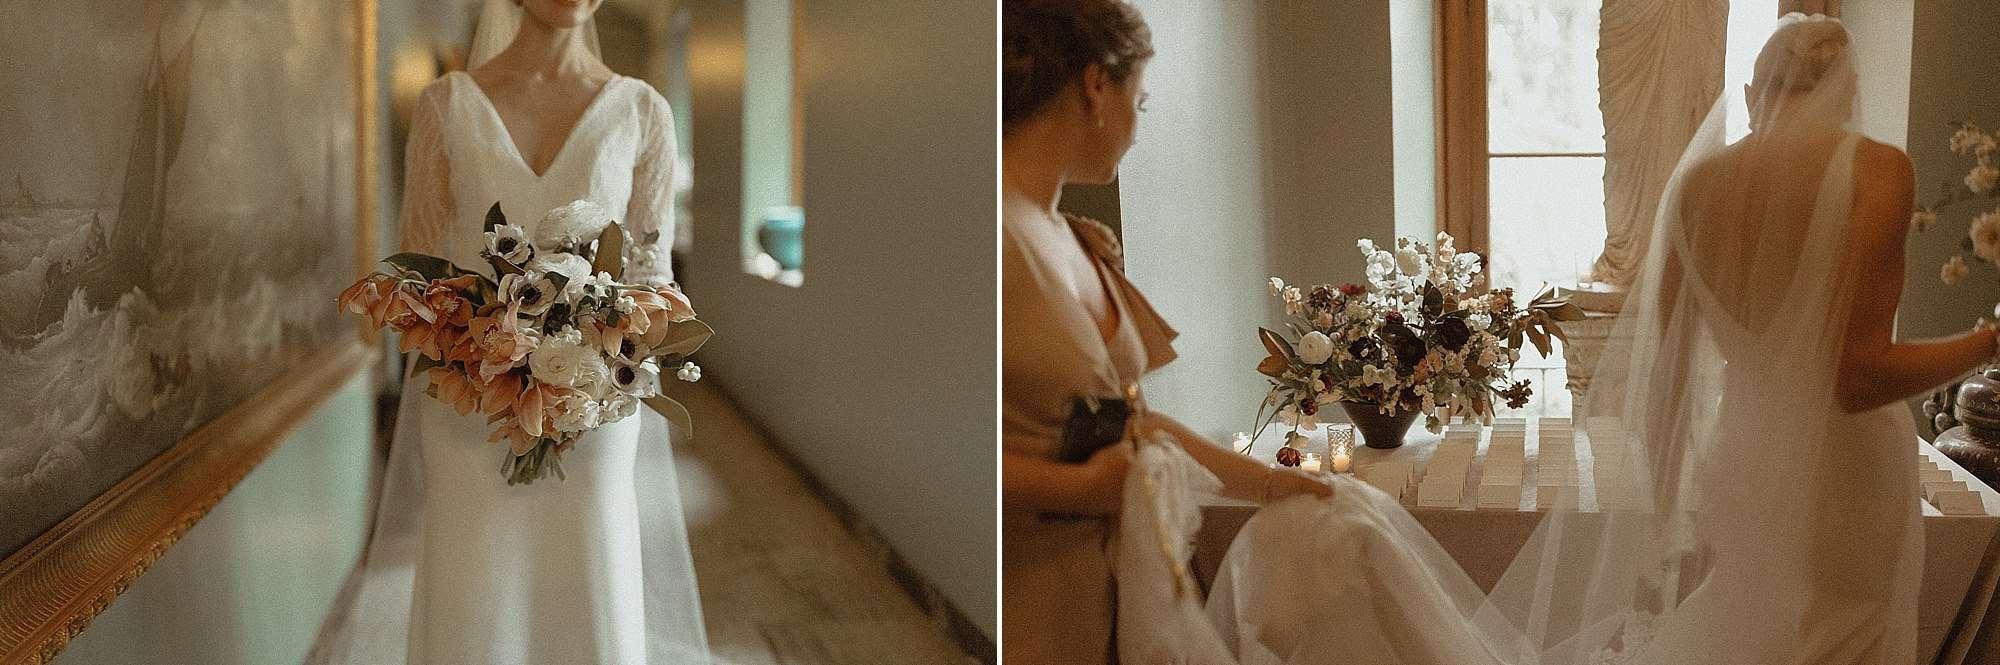 paramour estate wedding Los Angeles